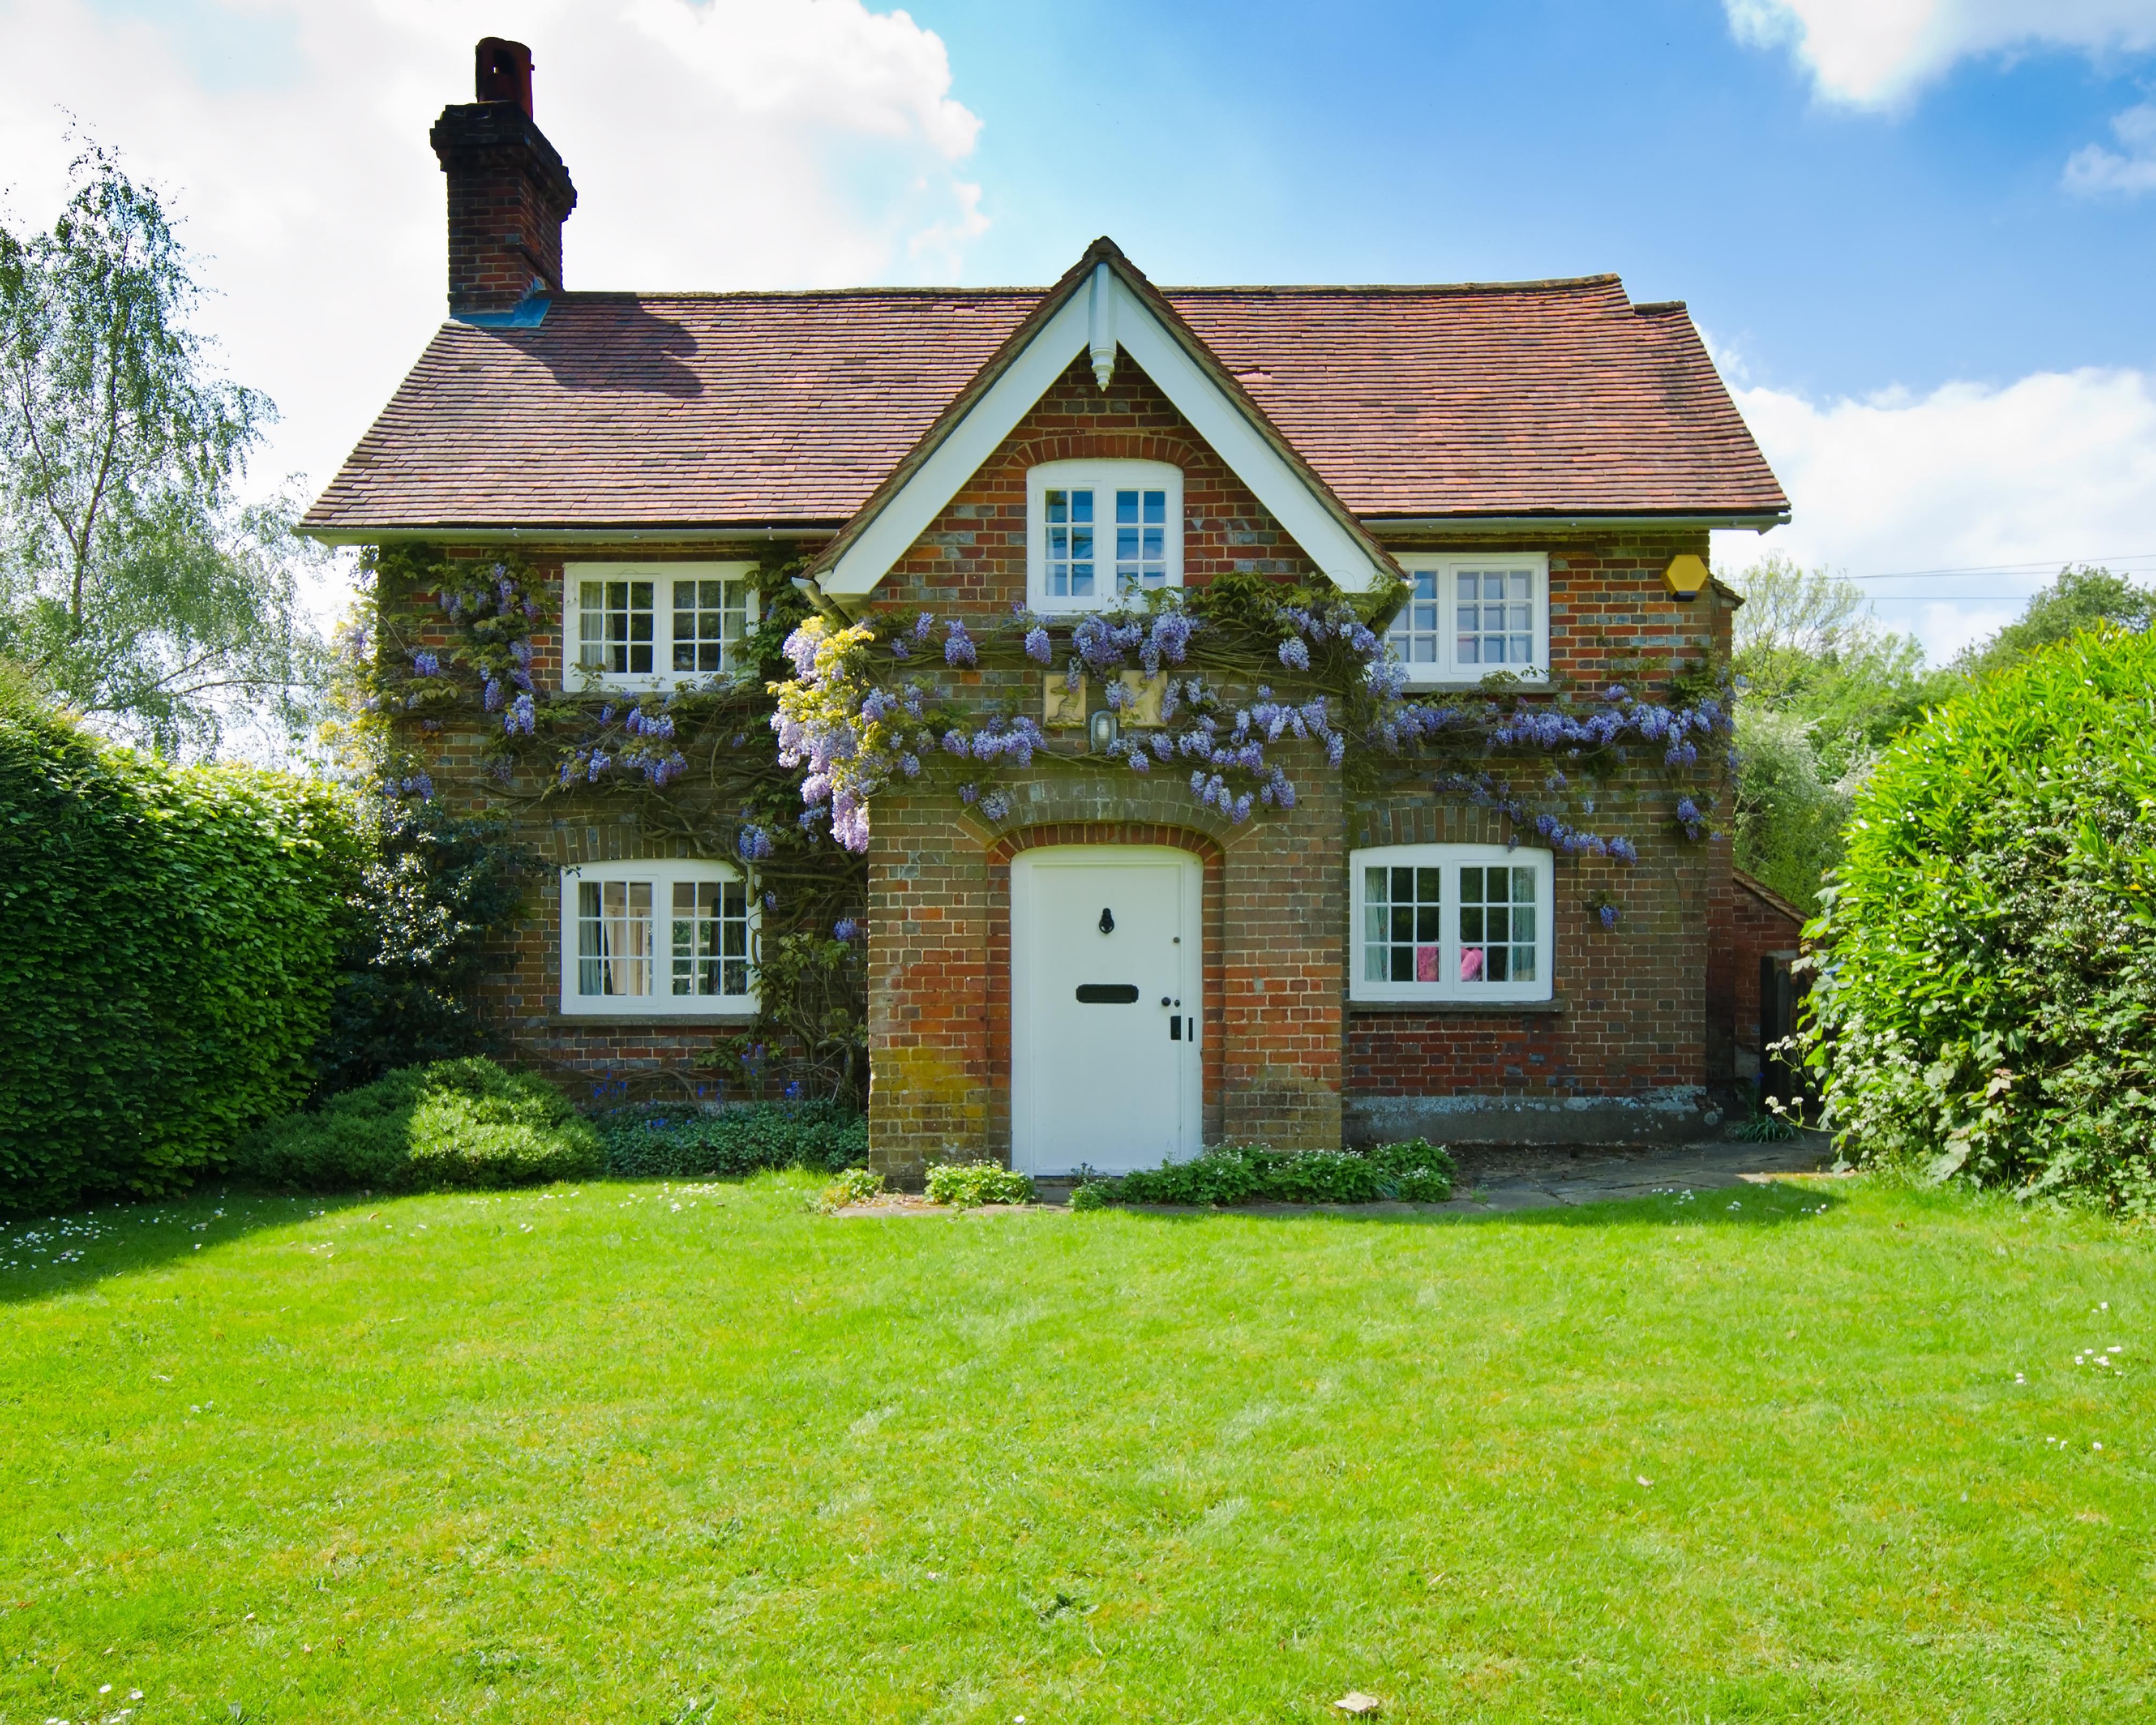 Victorian houses in Berkshire